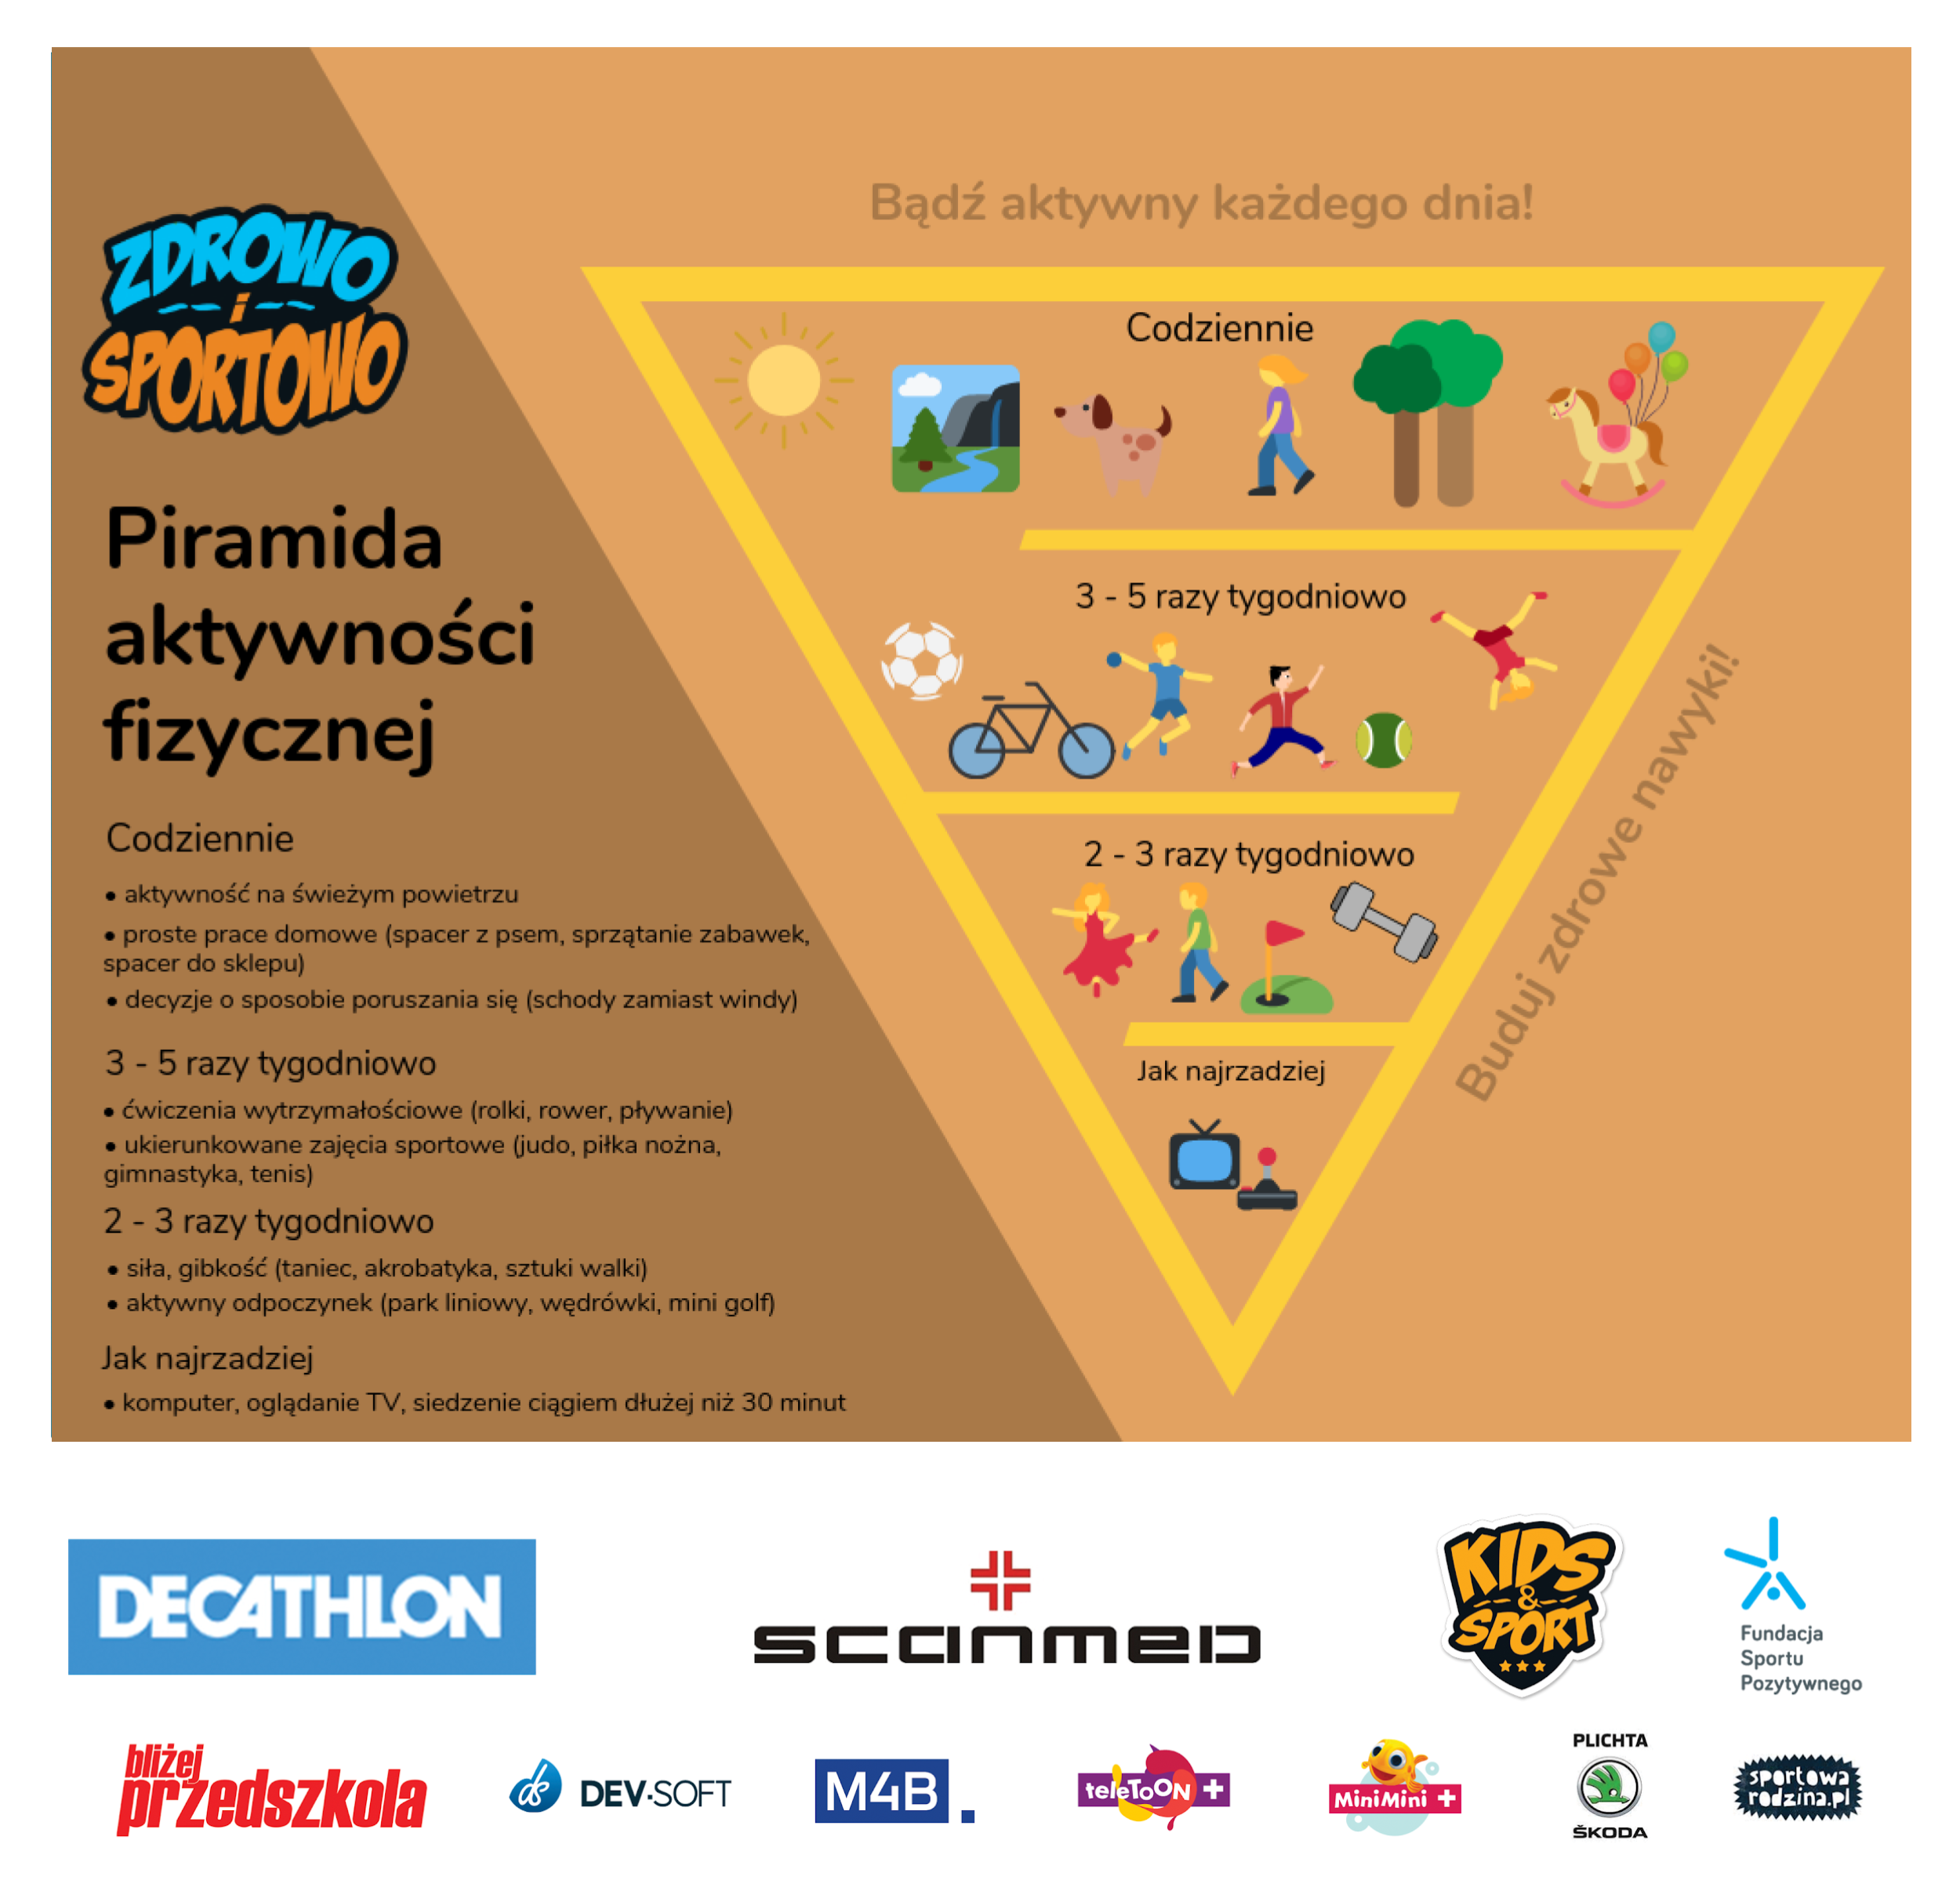 http://zdrowoisportowo.edu.pl/wp-content/uploads/2019/08/piramida-ver-5-1.png